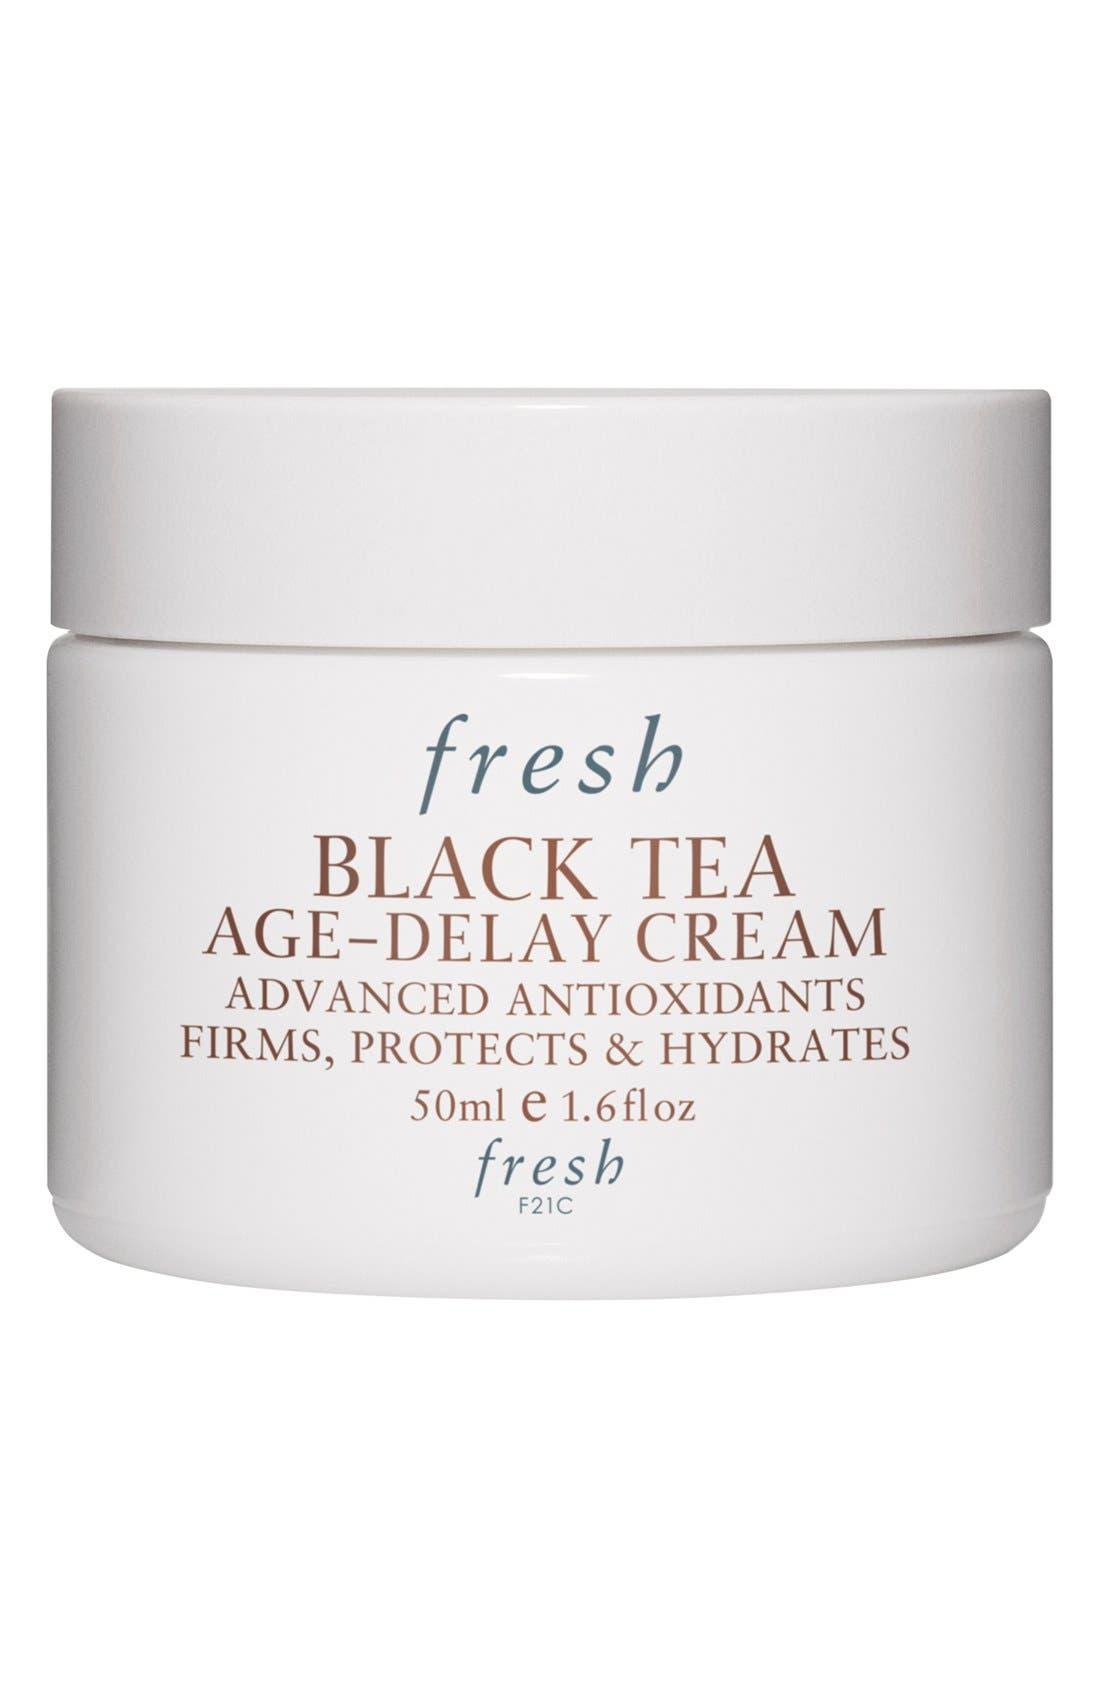 Black Tea Age-Delay Cream,                             Alternate thumbnail 3, color,                             NO COLOR